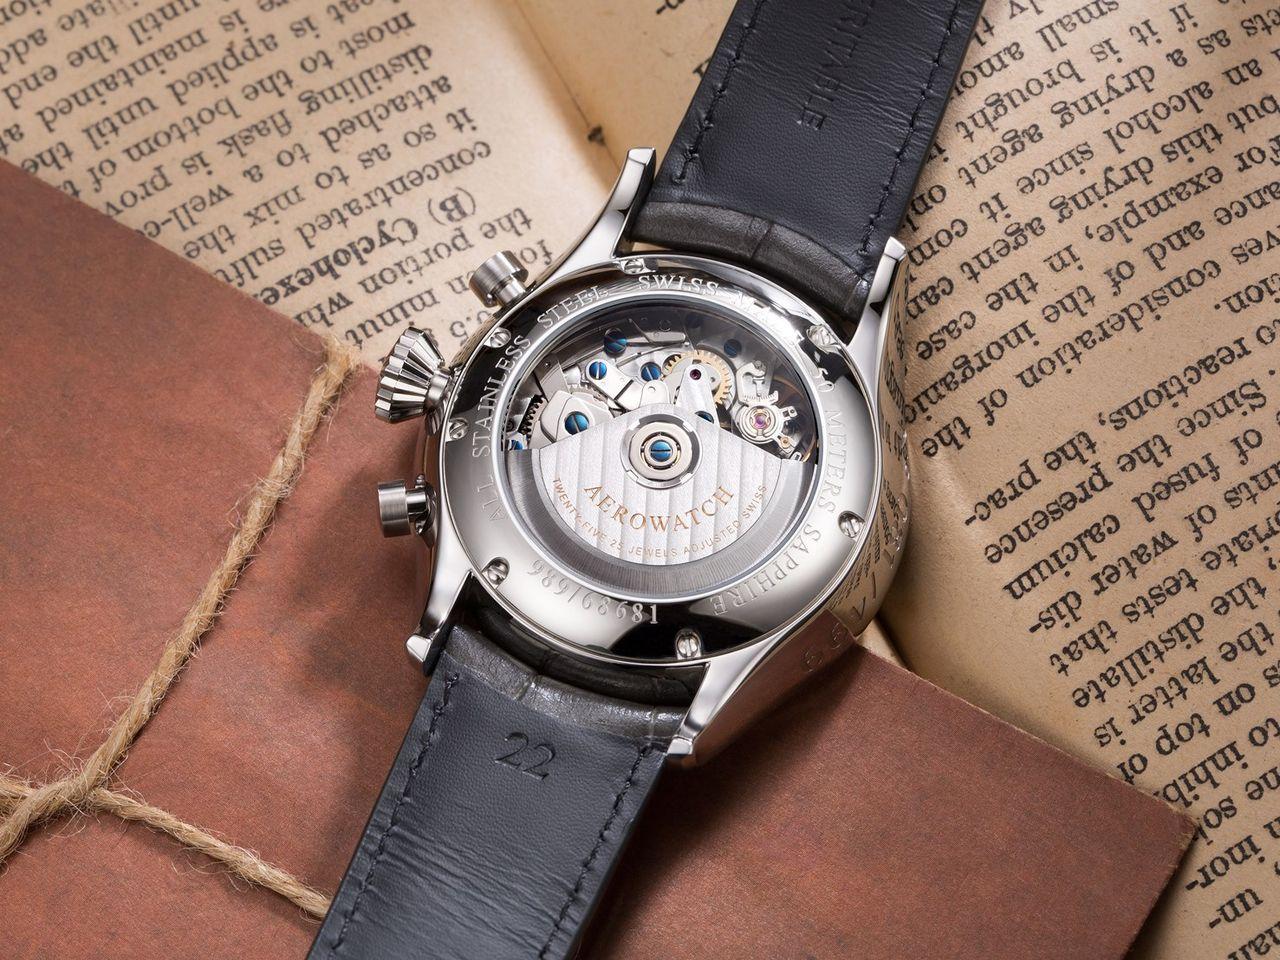 Aerowatch Les Grandes Classiques Chronograph Limited Edition - zafír elől, zafír hátul